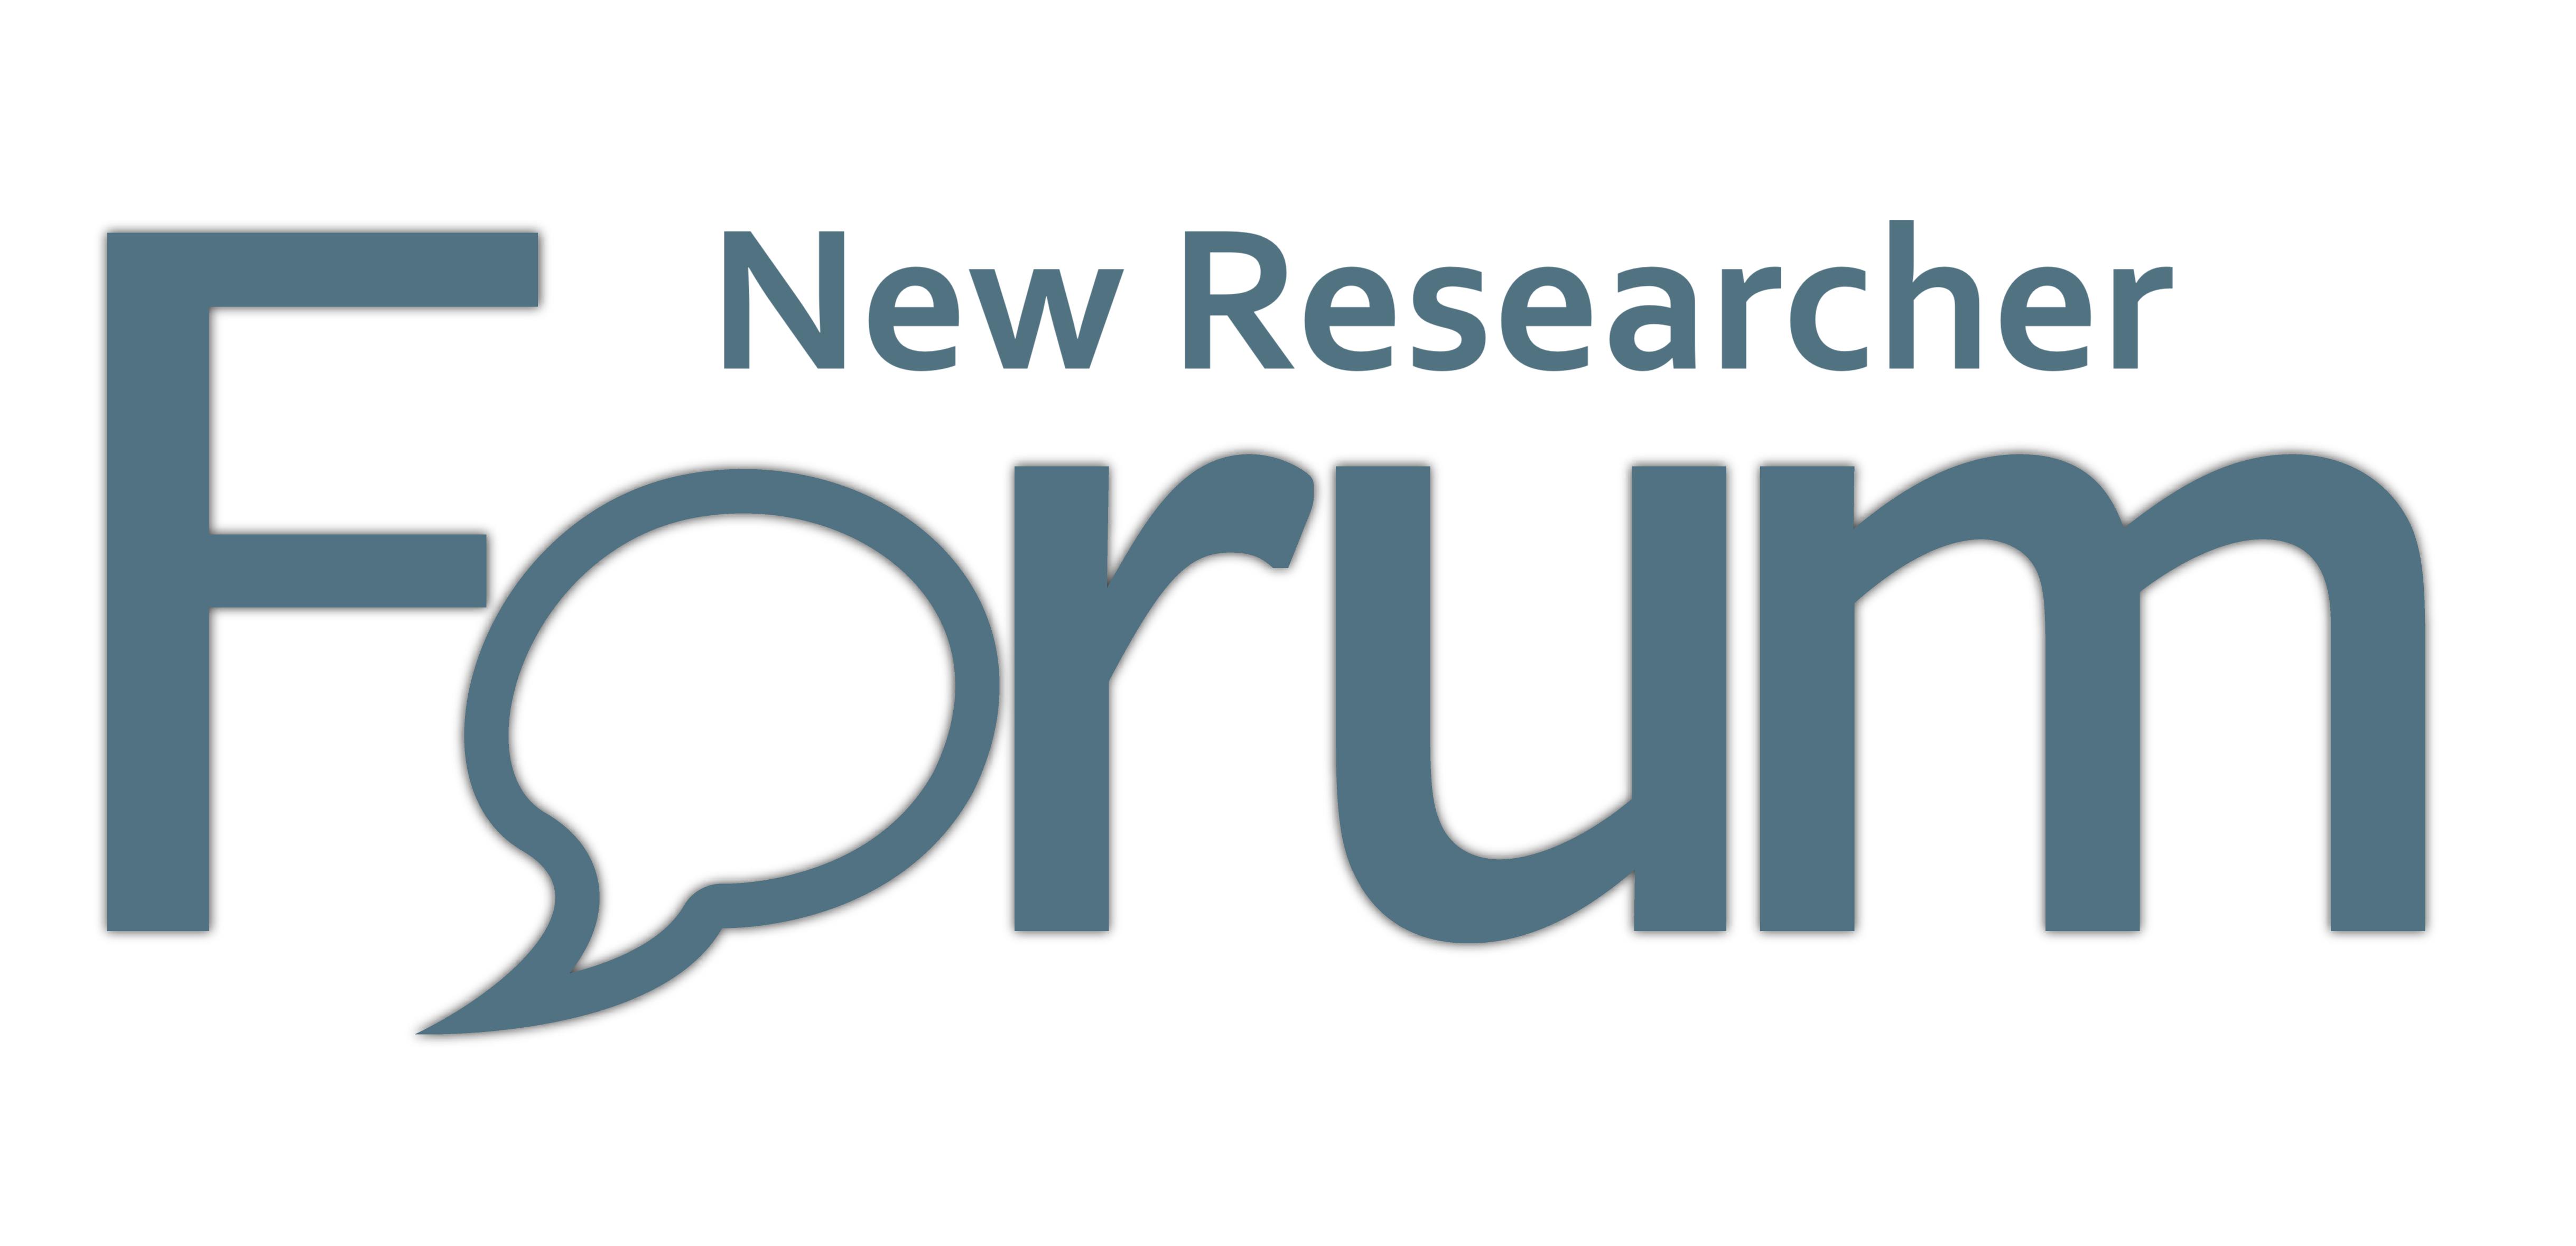 New Researcher Forum Logo